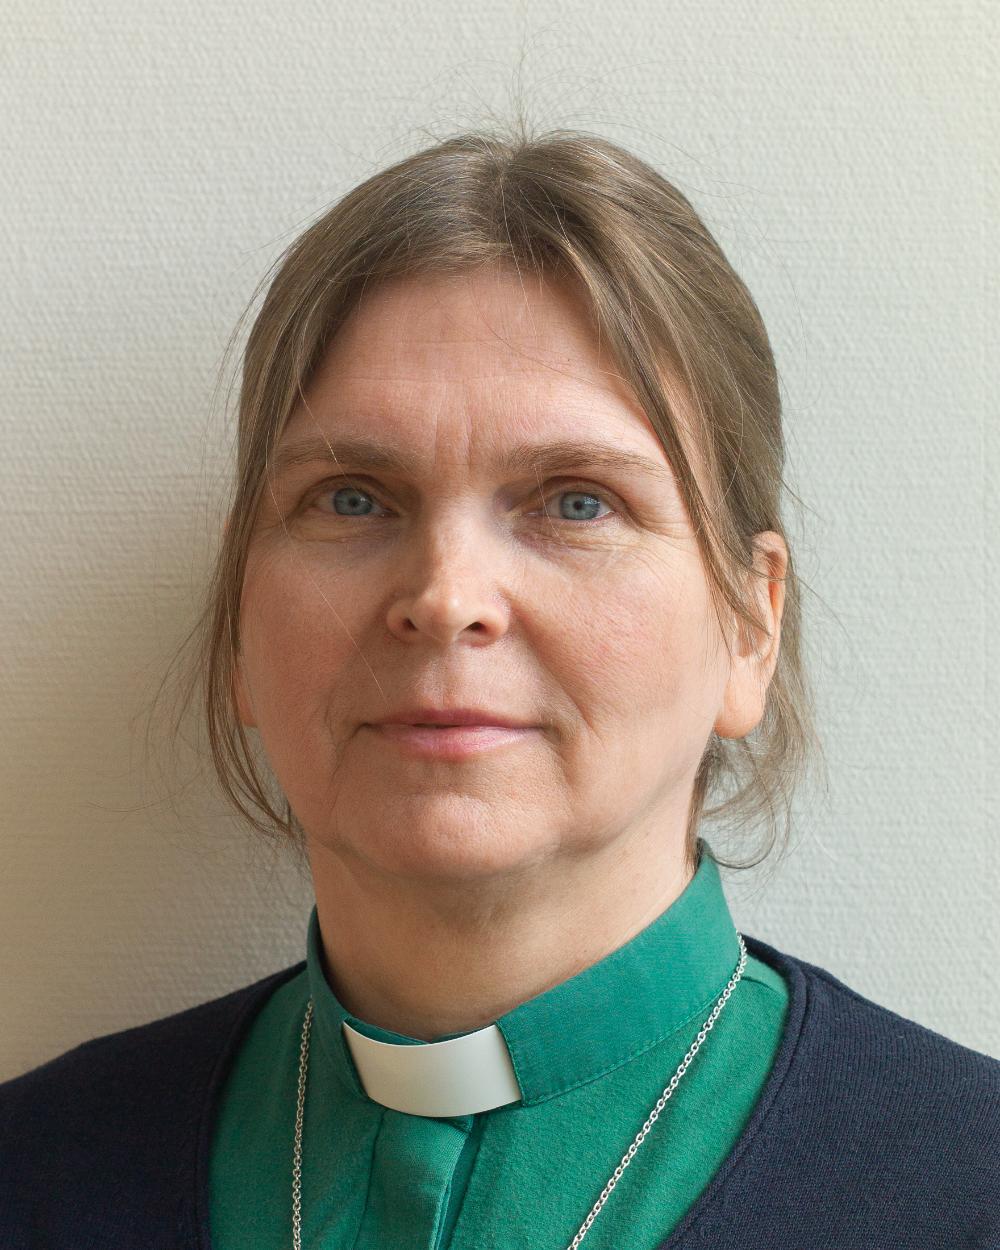 Leena Karjula